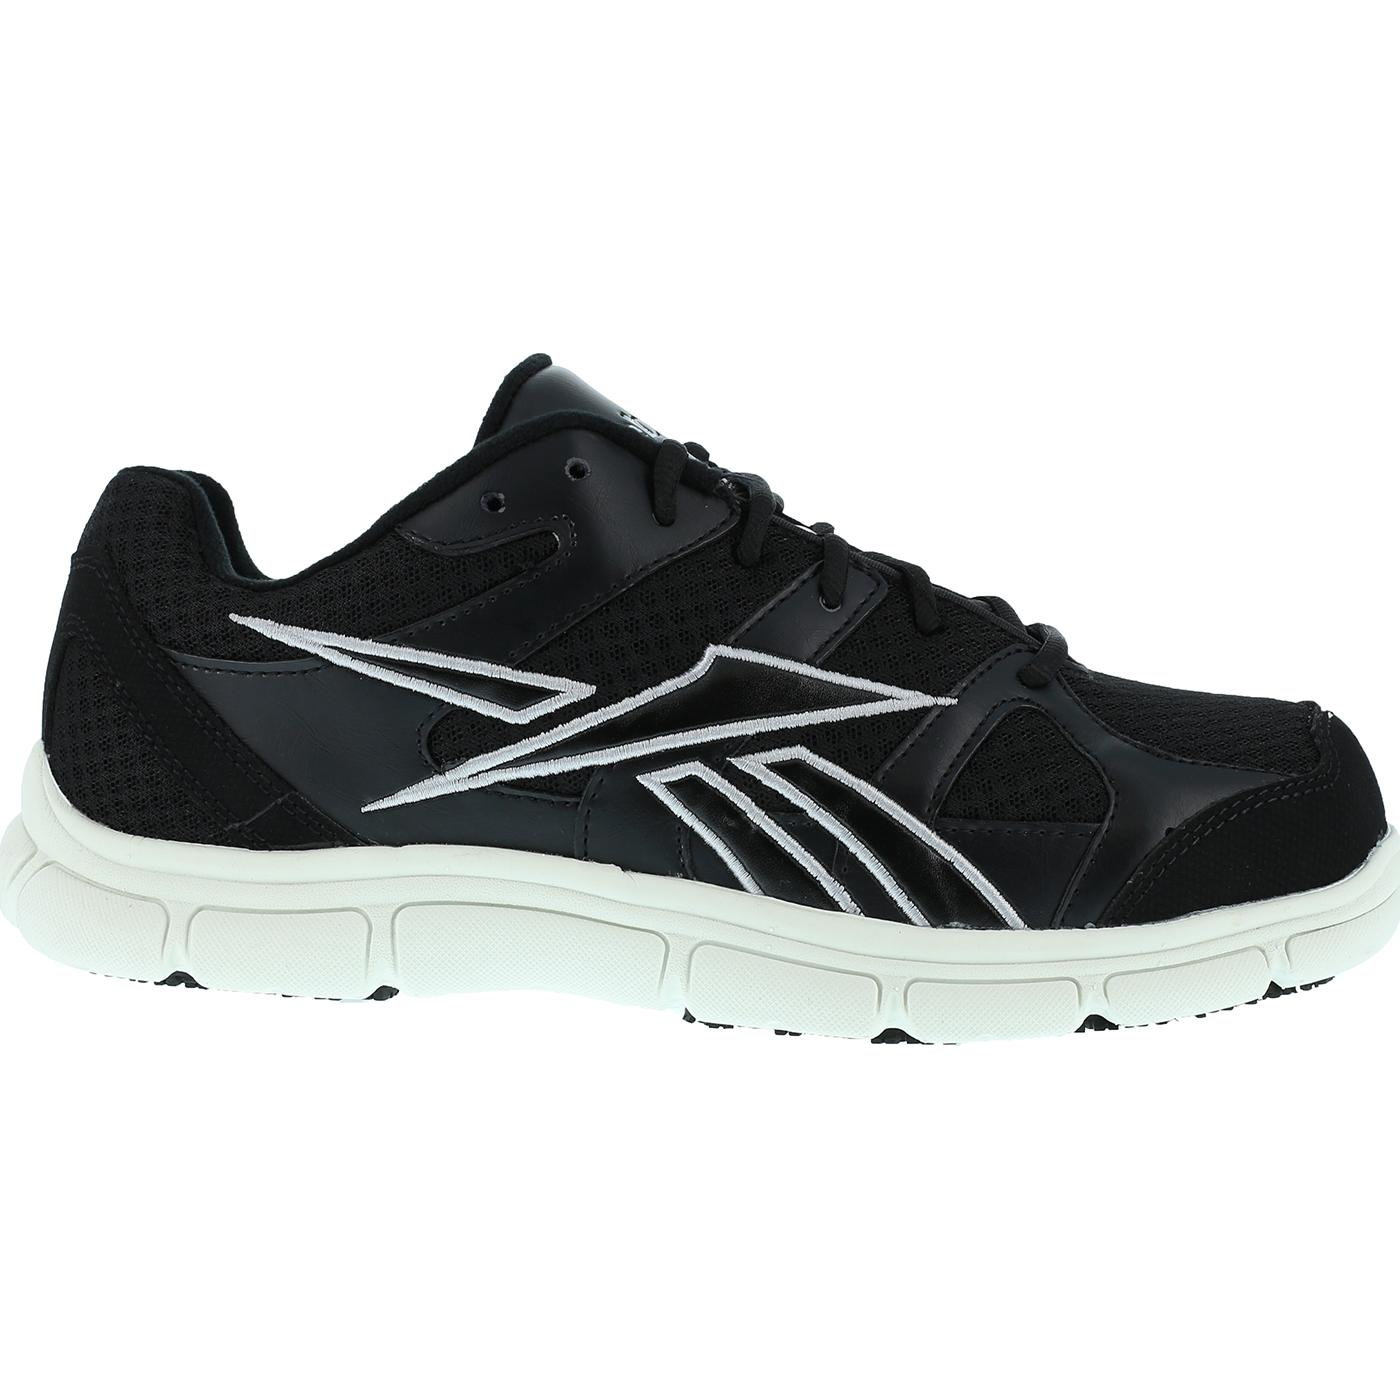 Reebok Non Slip Womens Shoes